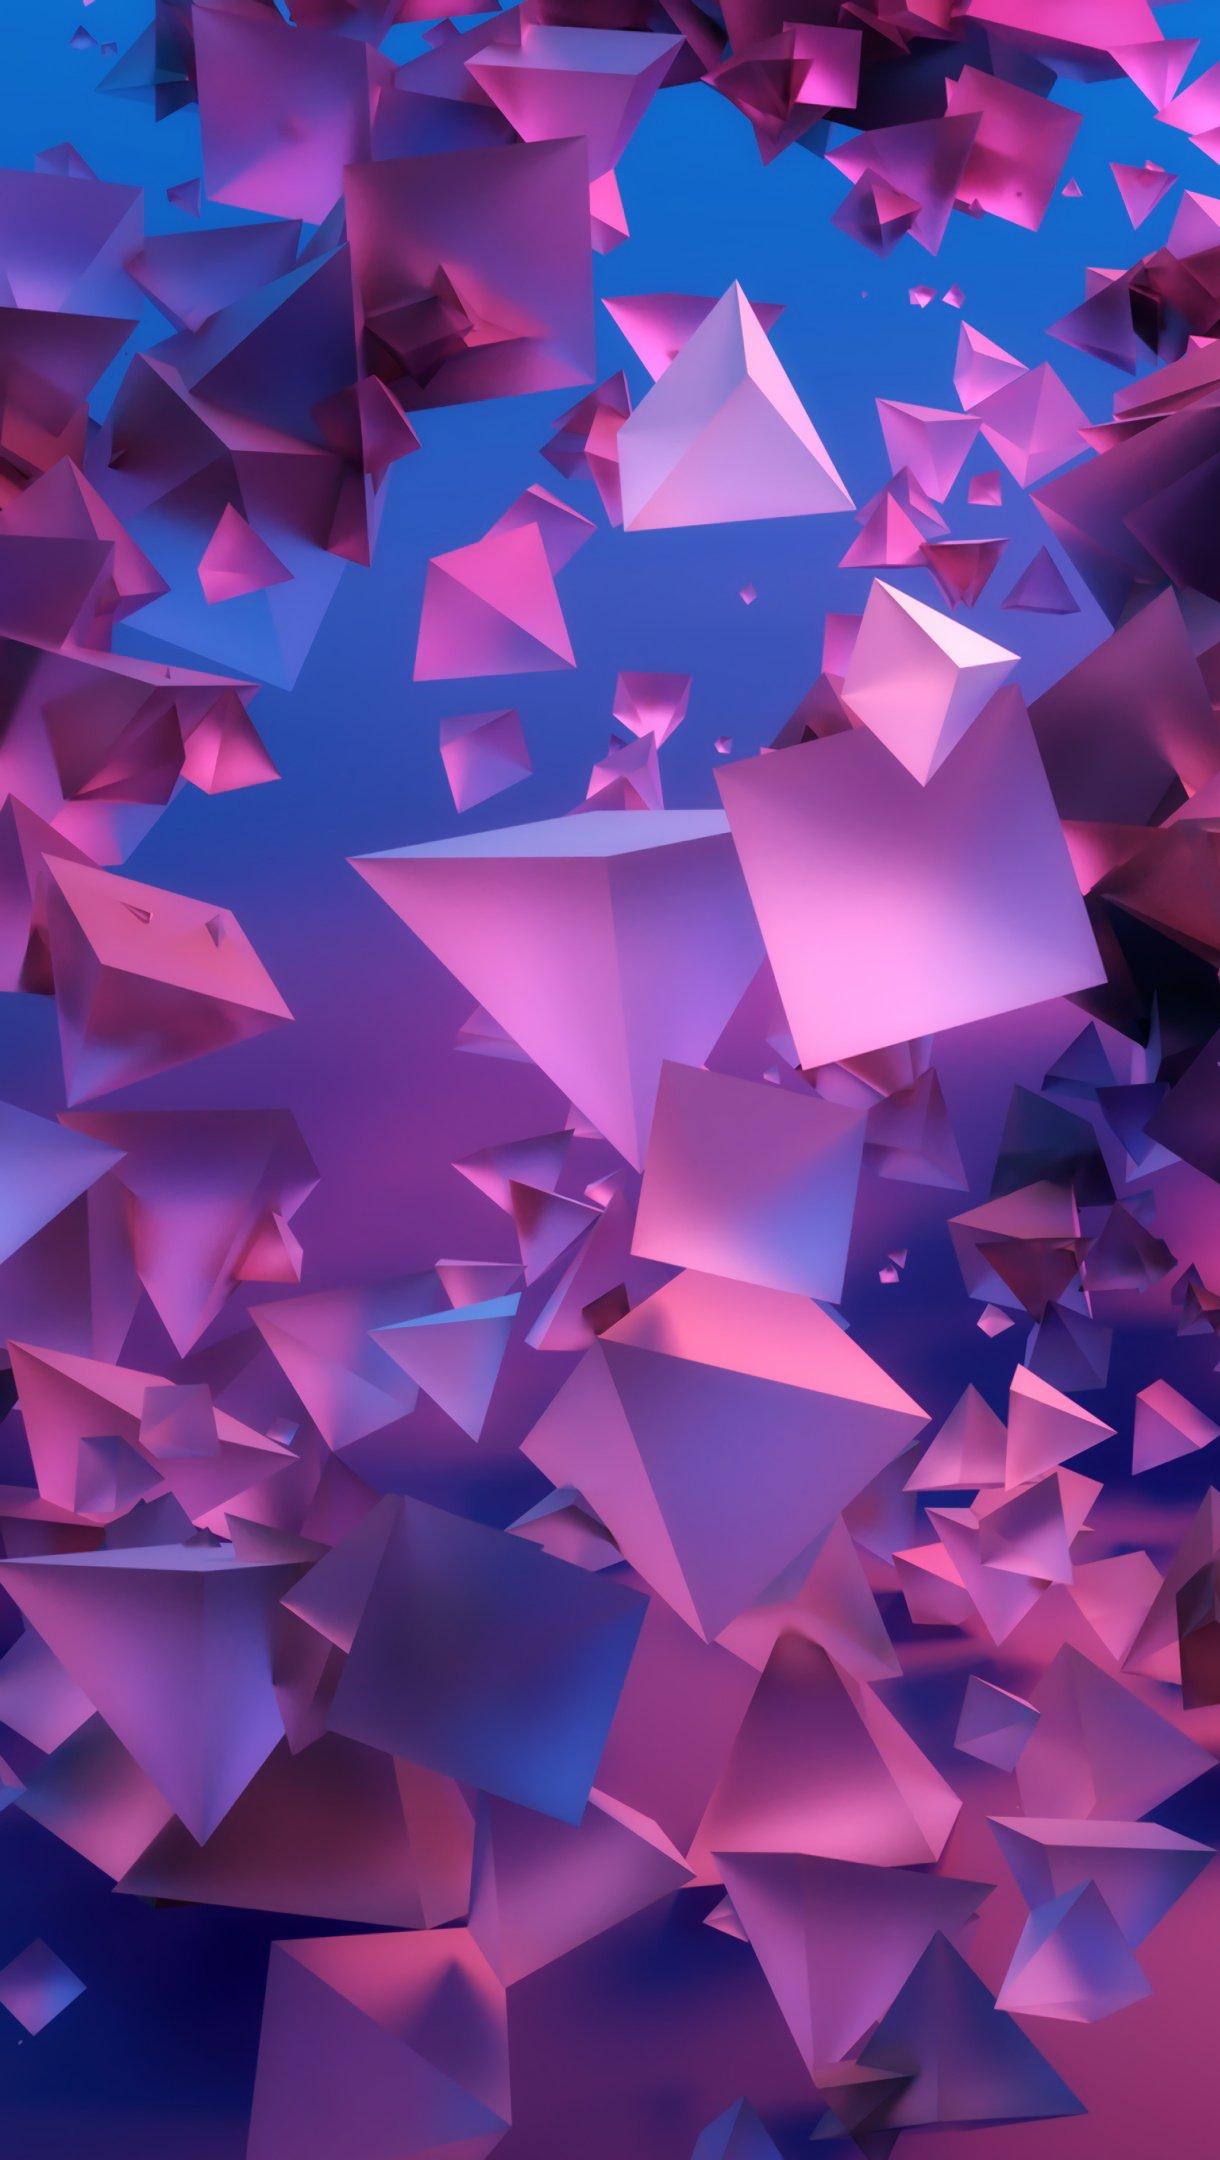 Abstract 3d Pyramids Wallpaper 4k Ultra HD ID:3774